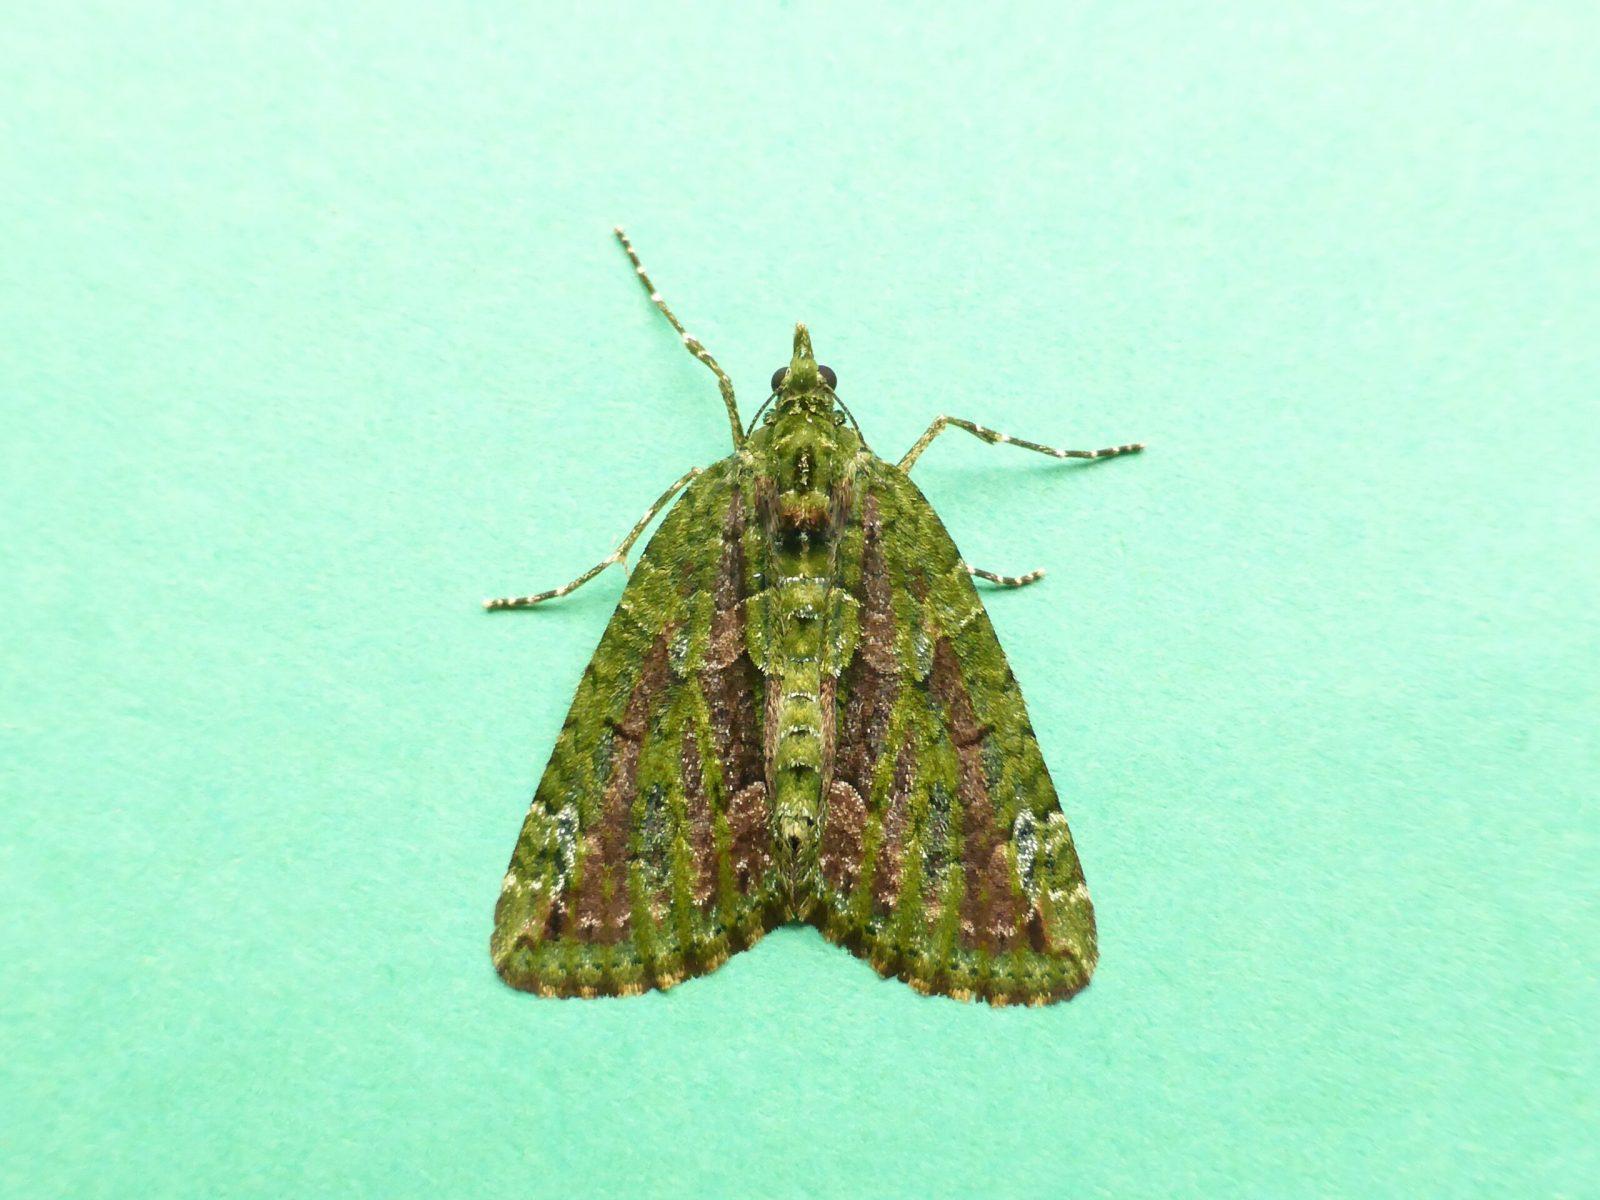 Chloroclysta siterata - Red-green Carpet - Kirk Smeaton,